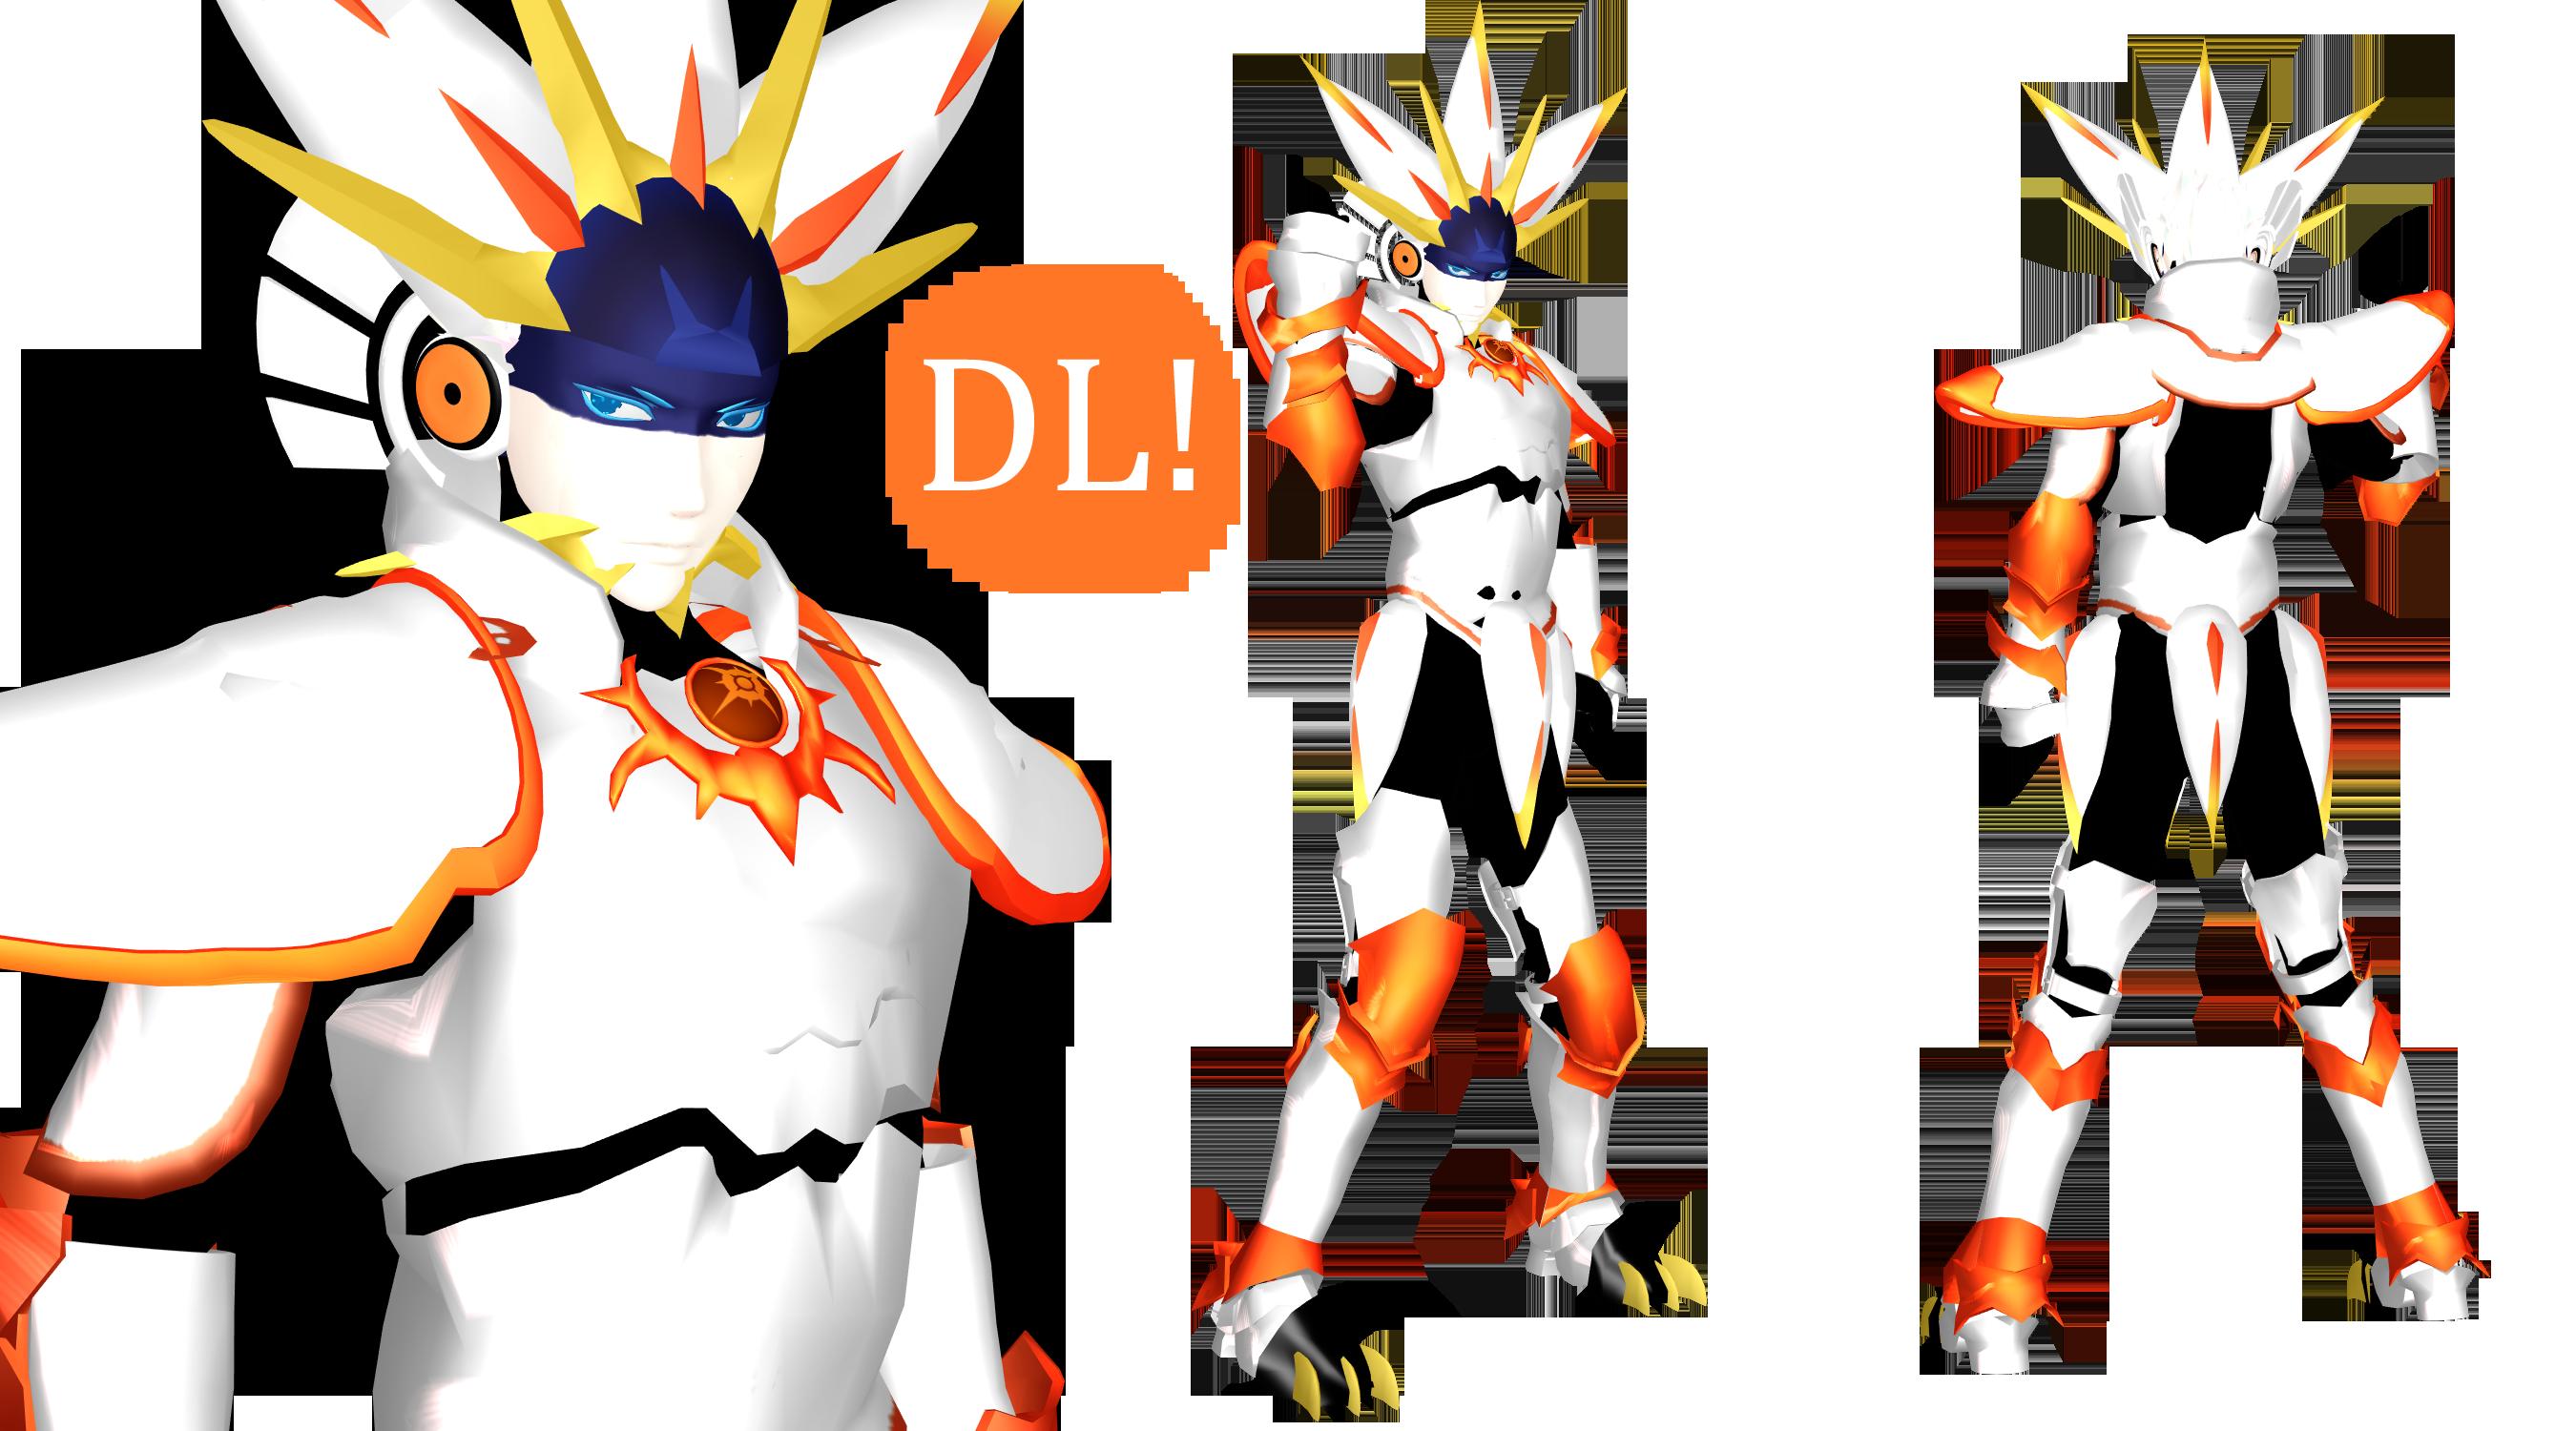 [MMD] Solgaleo Gijinka DL (Pokemon Sun and Moon) by DrStinger